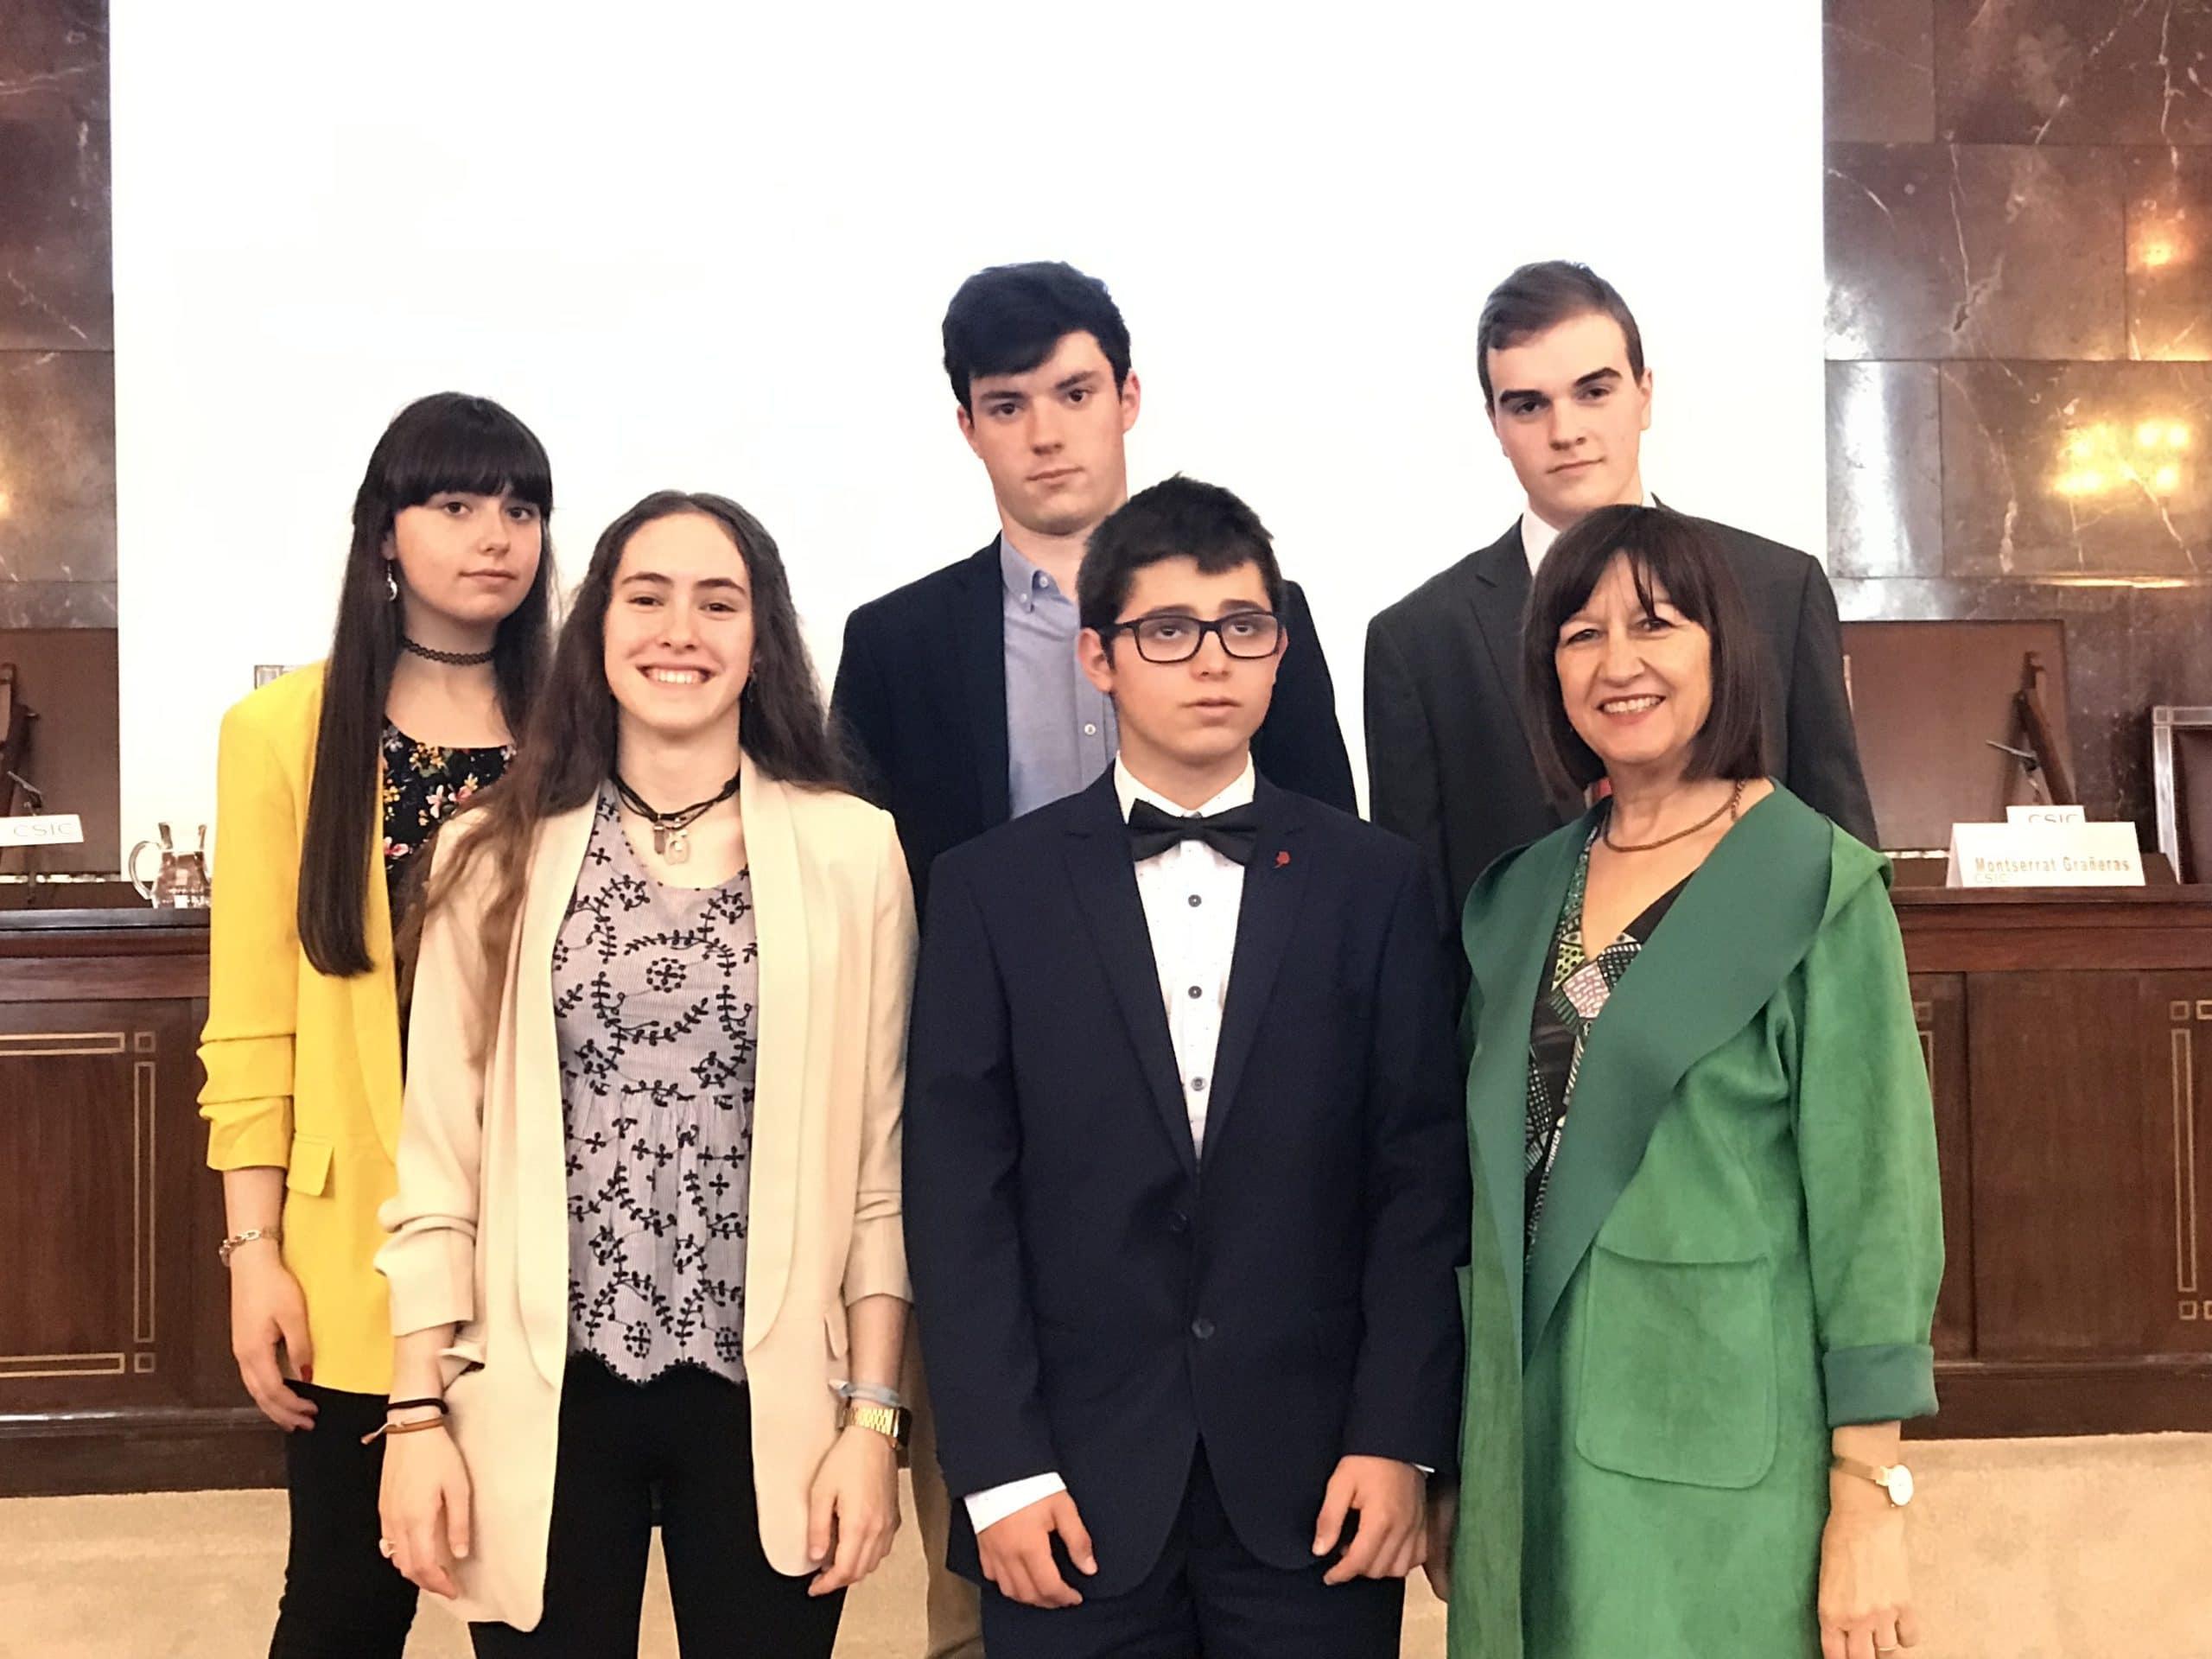 X Congreso Investiga I+D+i (Colegio Filipense Blanca de Castilla)